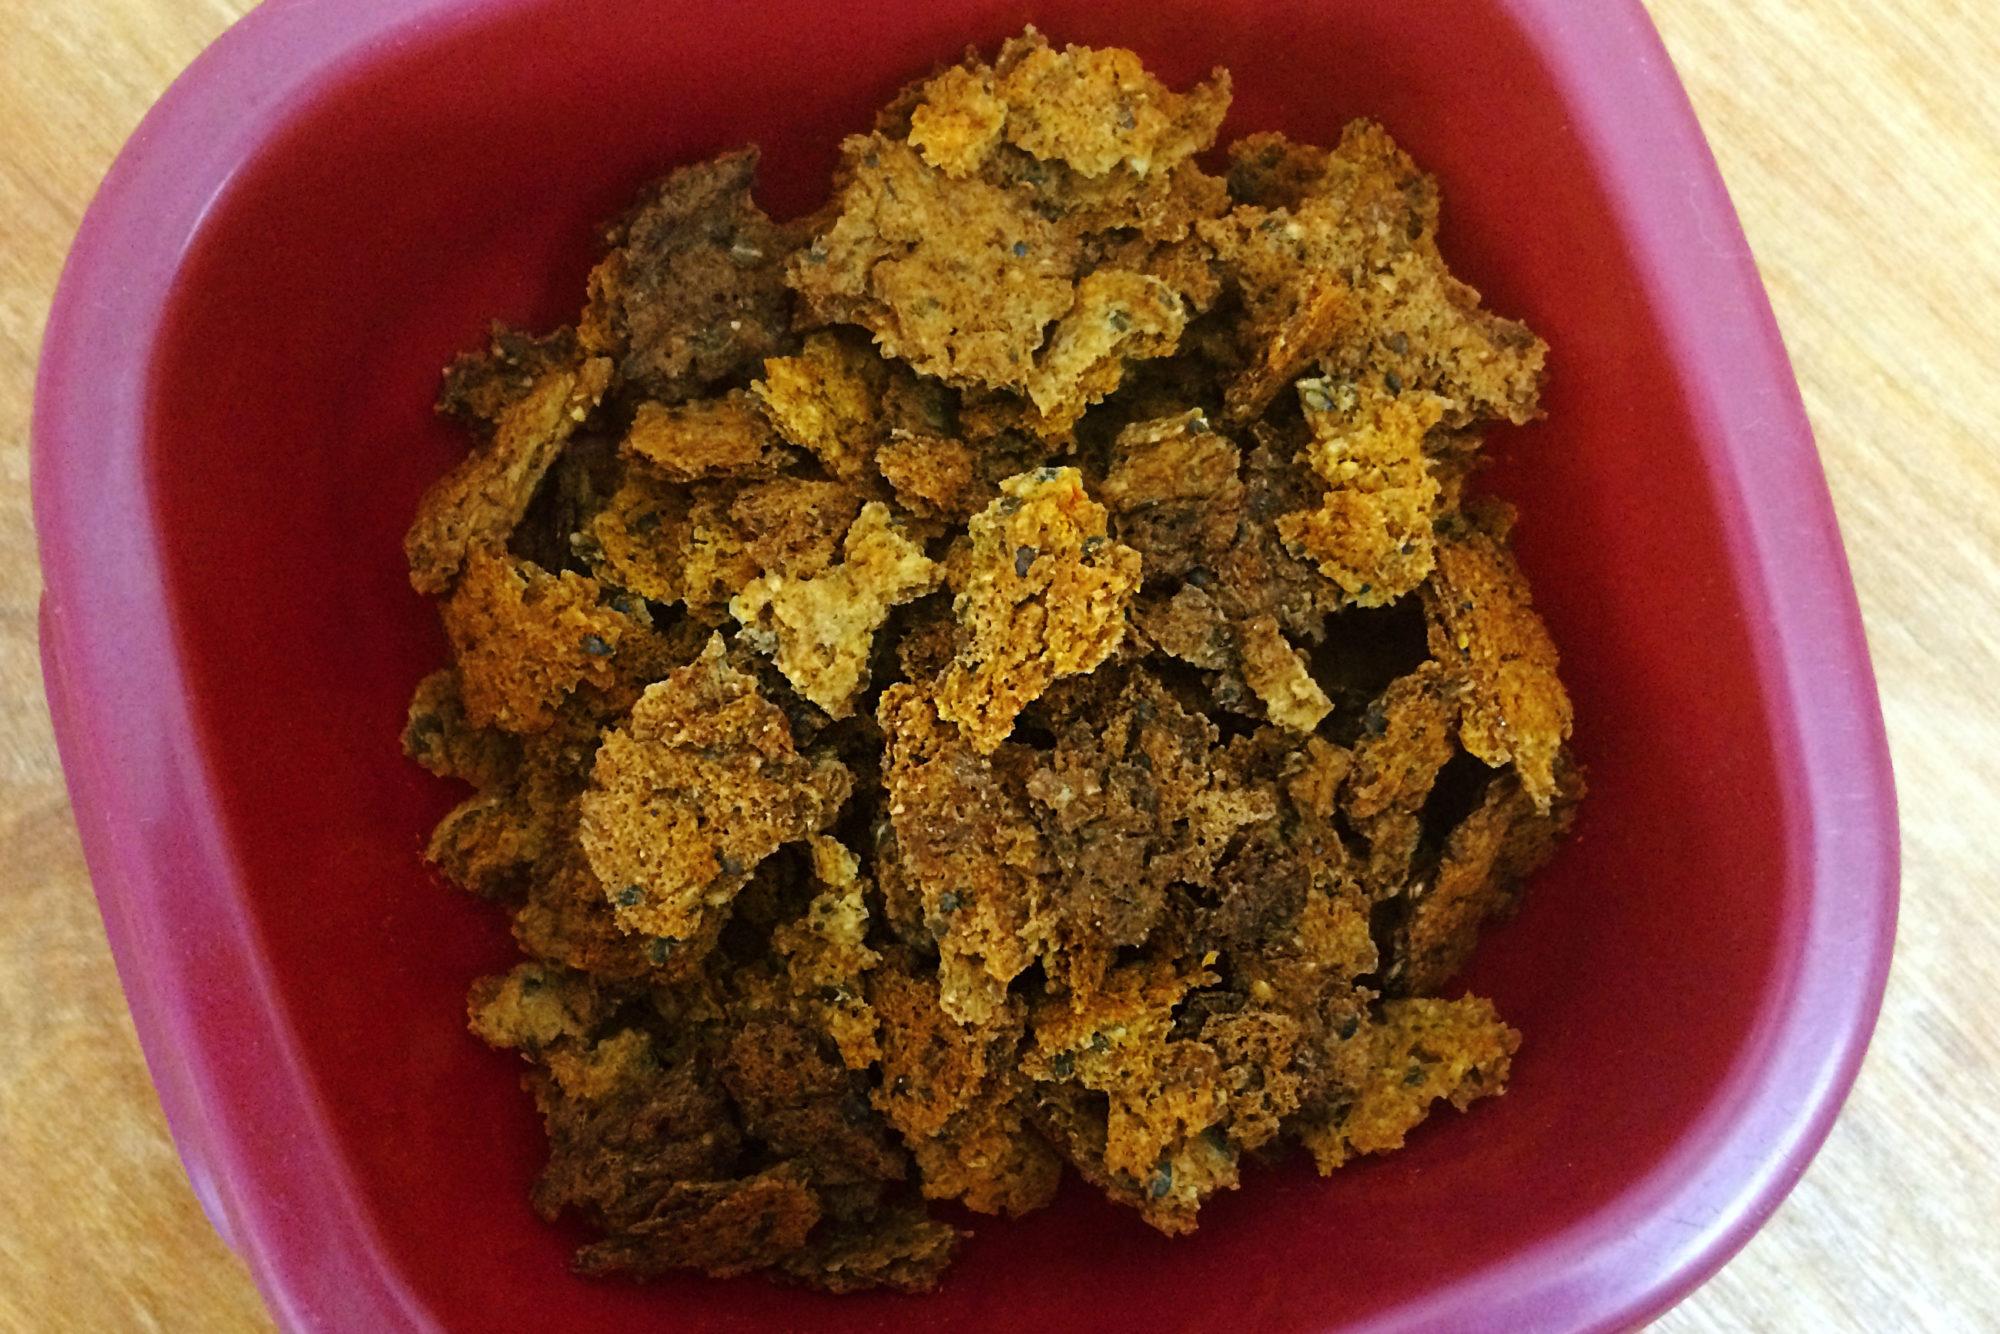 dry vegan dog food